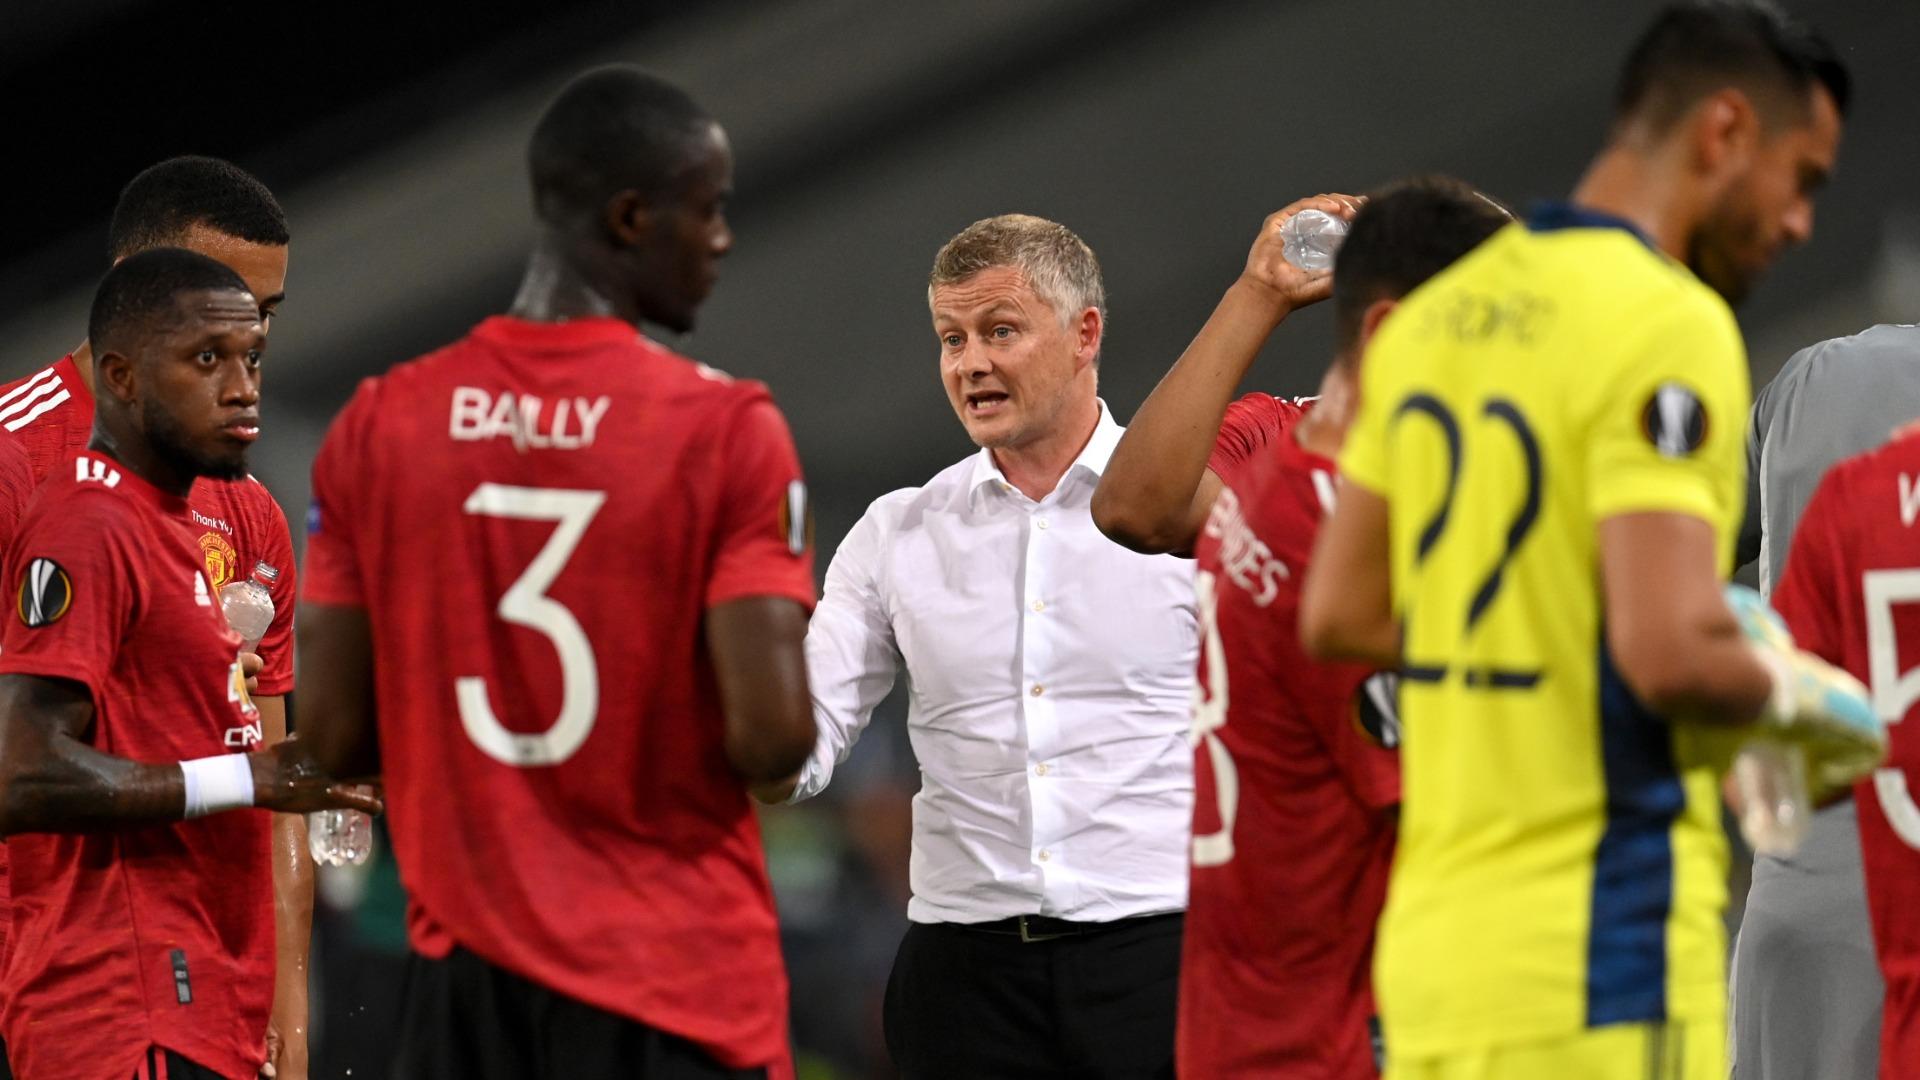 Man Utd must be more clinical as Solskjaer targets 'next step' in semis